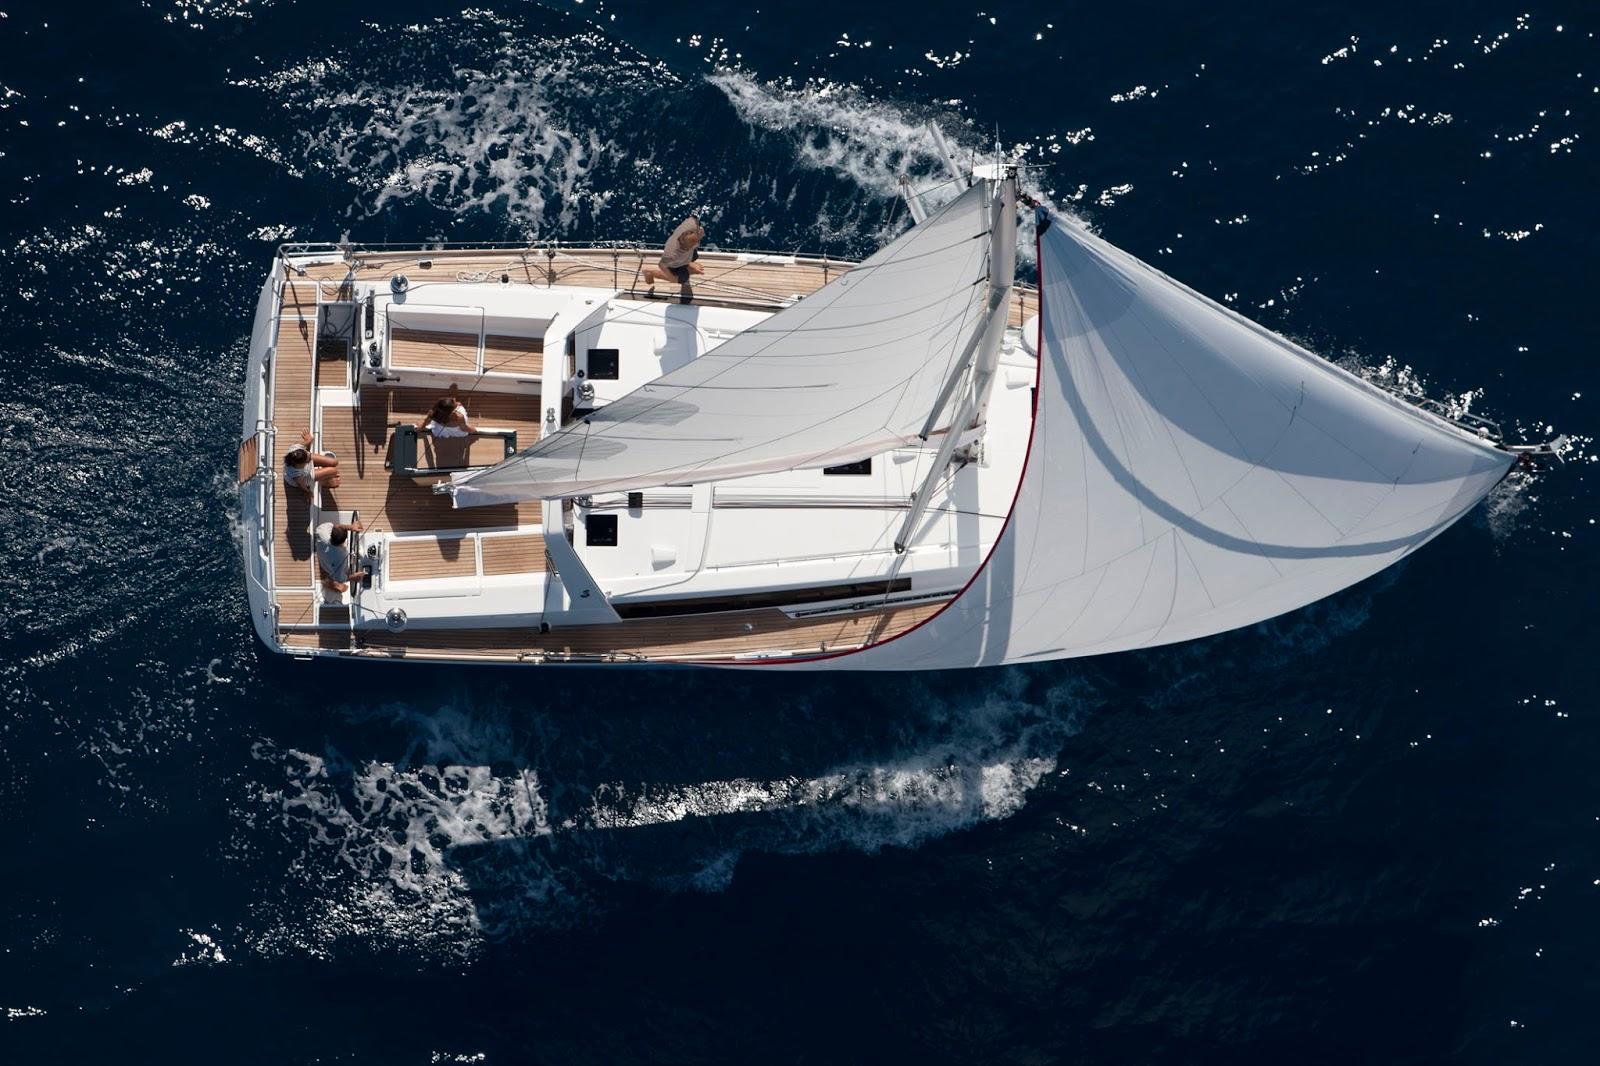 alquiler de veleros baratos en ibiza. alquiler veleros baratos ibiza. alquiler de veleros en ibiza. alquiler veleros ibiza. alquilar veleros en ibiza. veleros de alquiler en ibiza